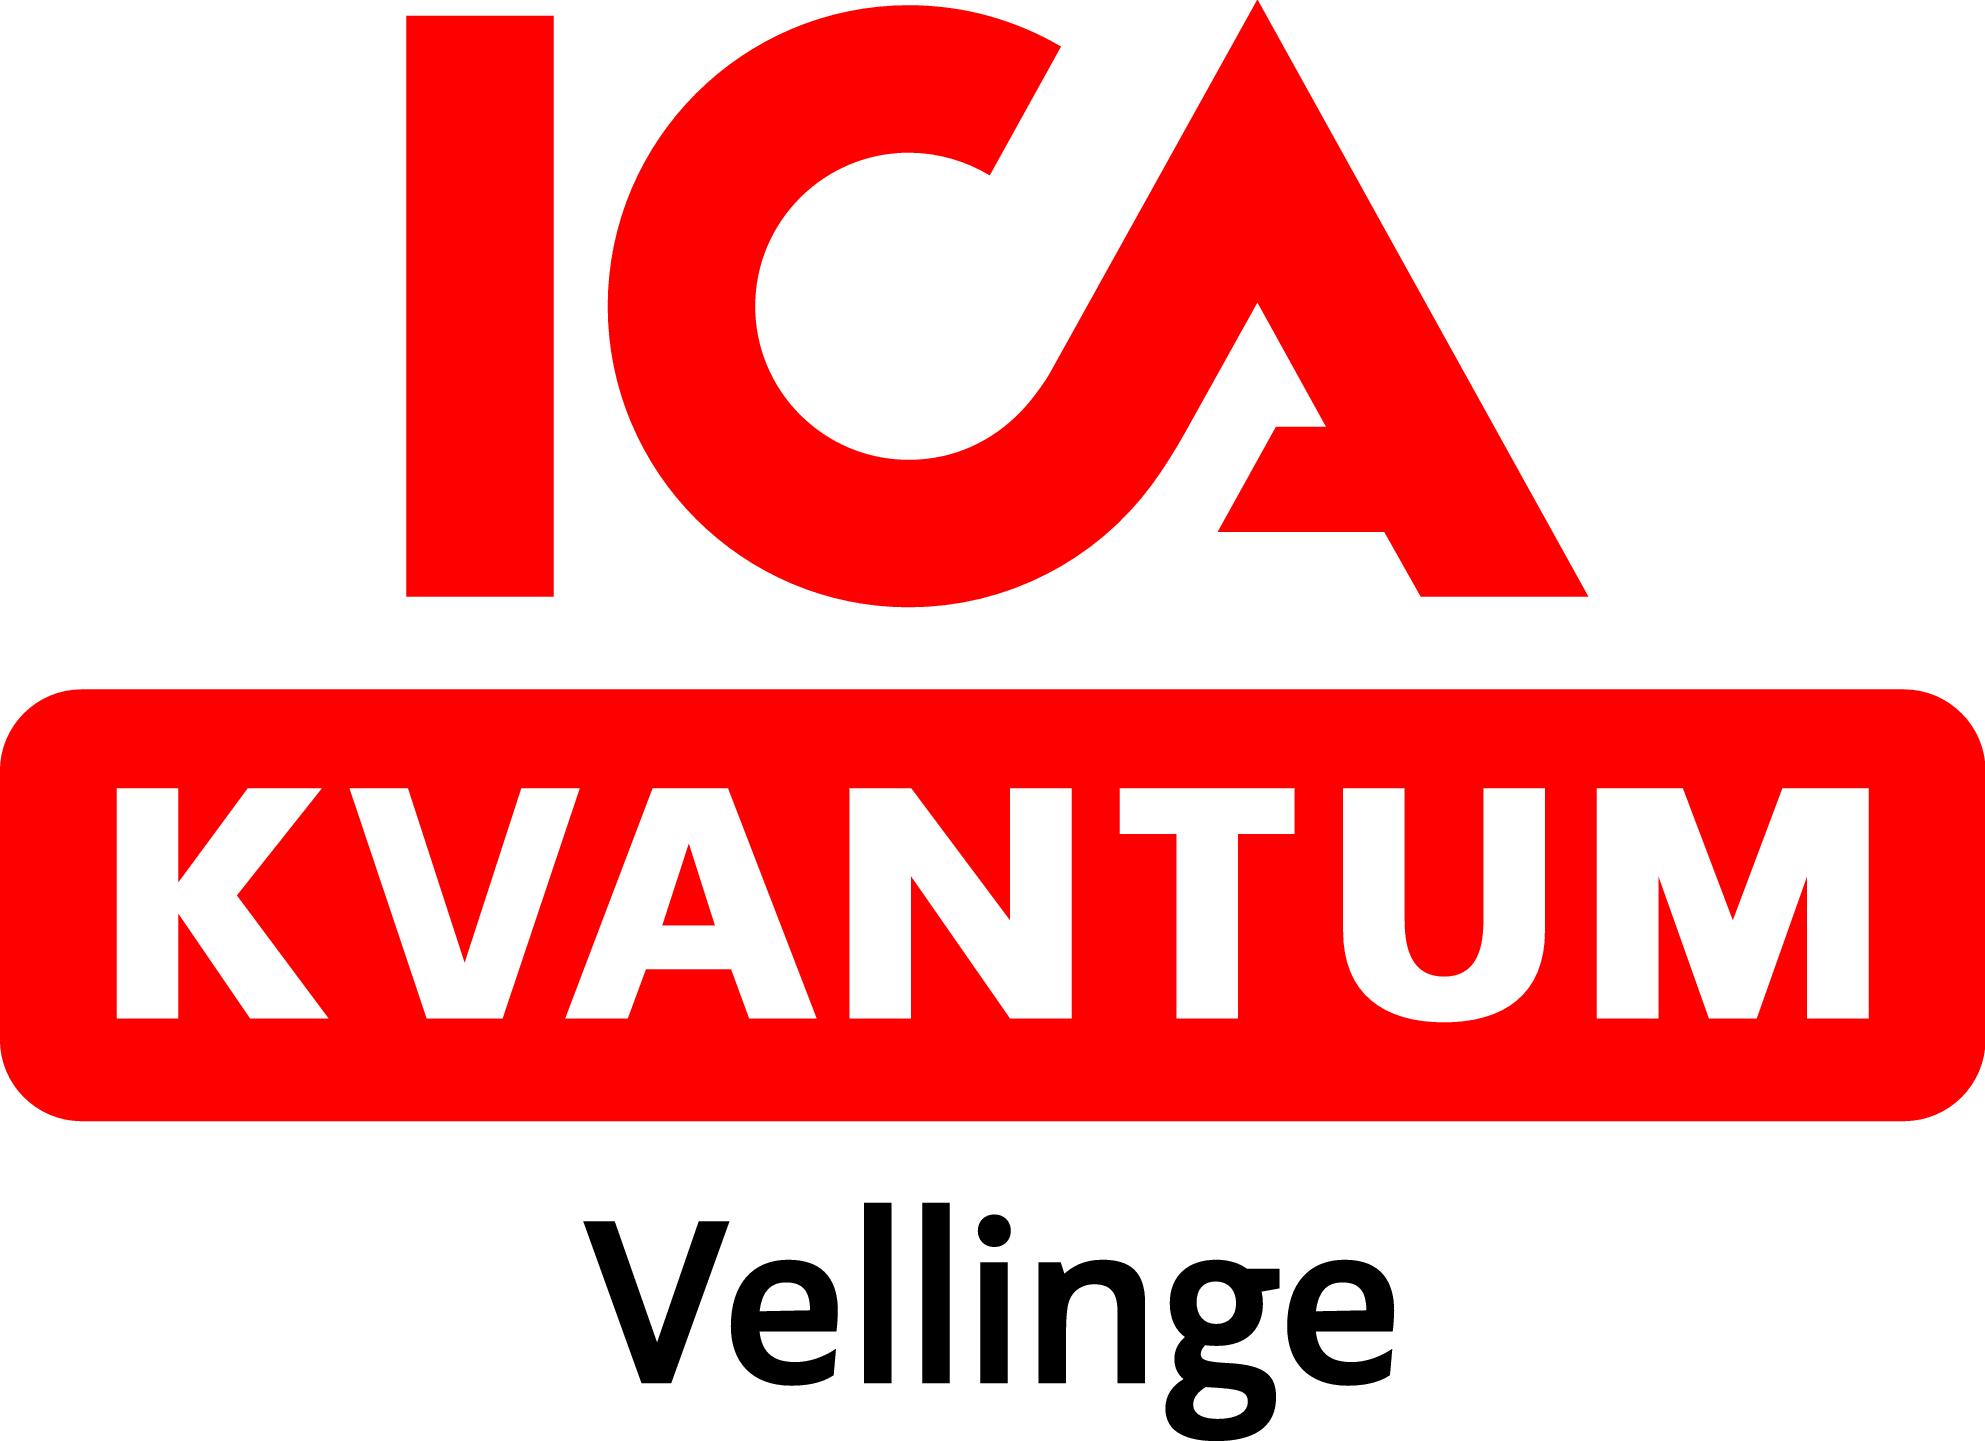 ICA Kvantum Vellinge logotyp